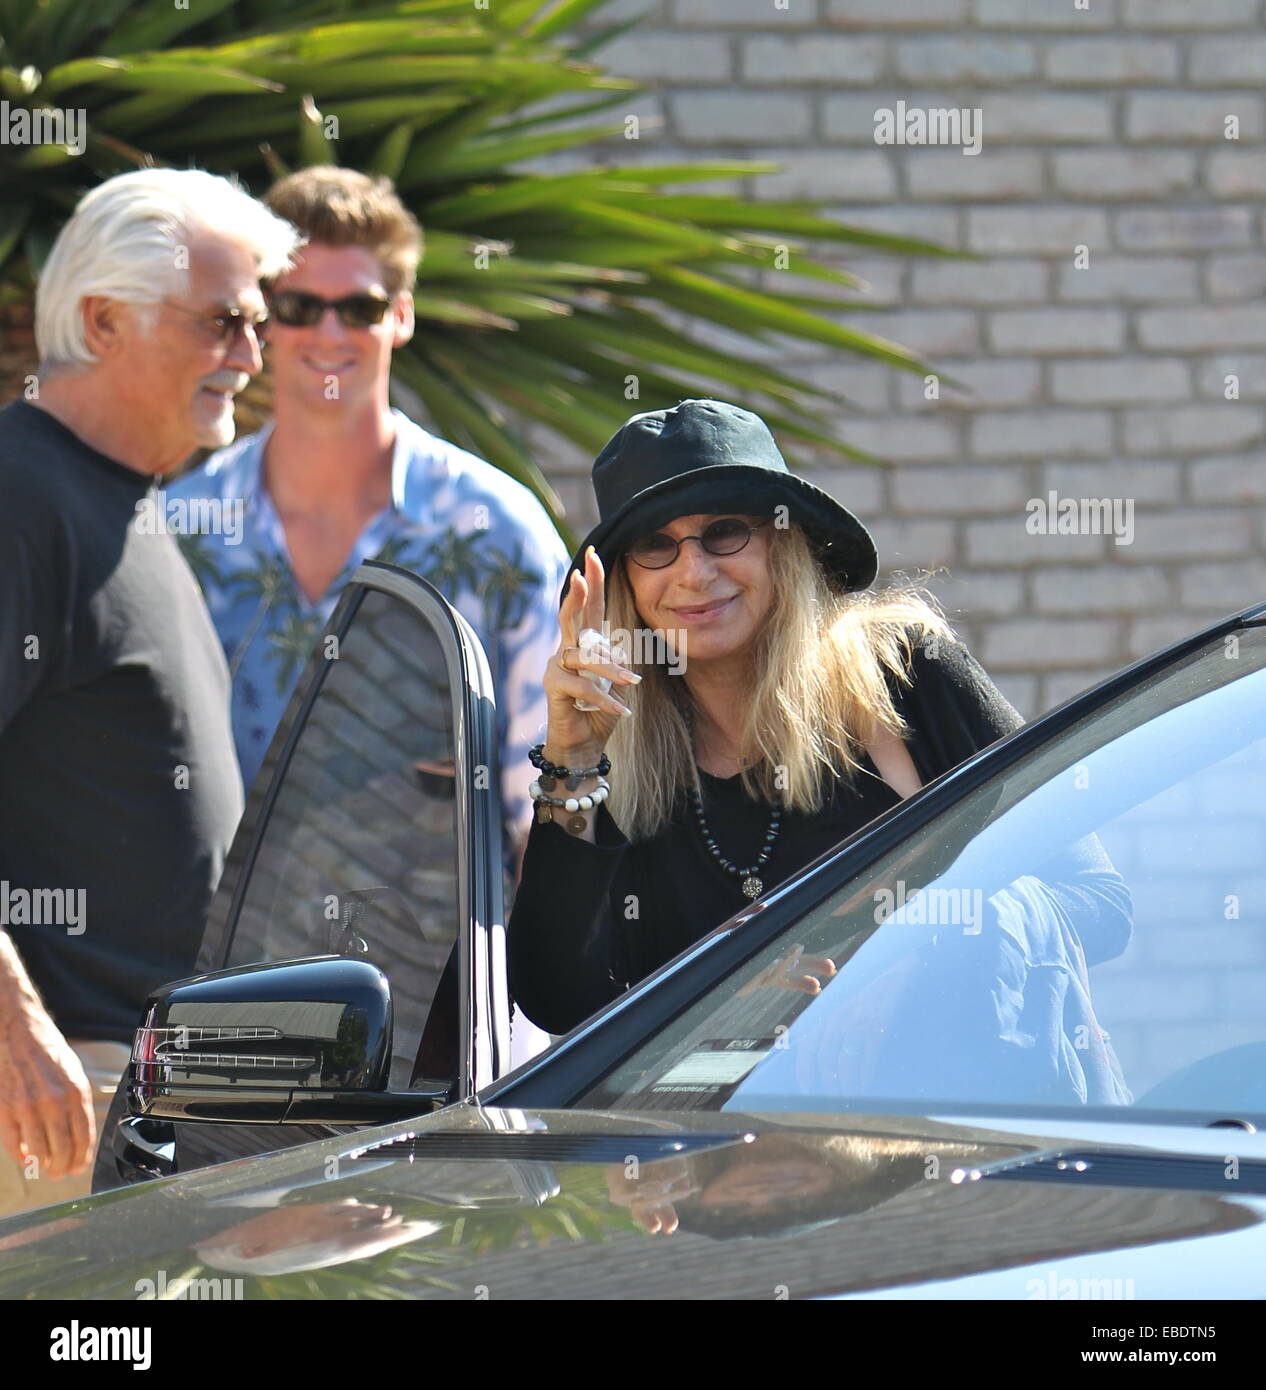 Barbra Streisand And James Brolin Leaving Joel Silvers Malibu Beach Stock Photo Alamy,Landscaping Backyard Ideas No Grass